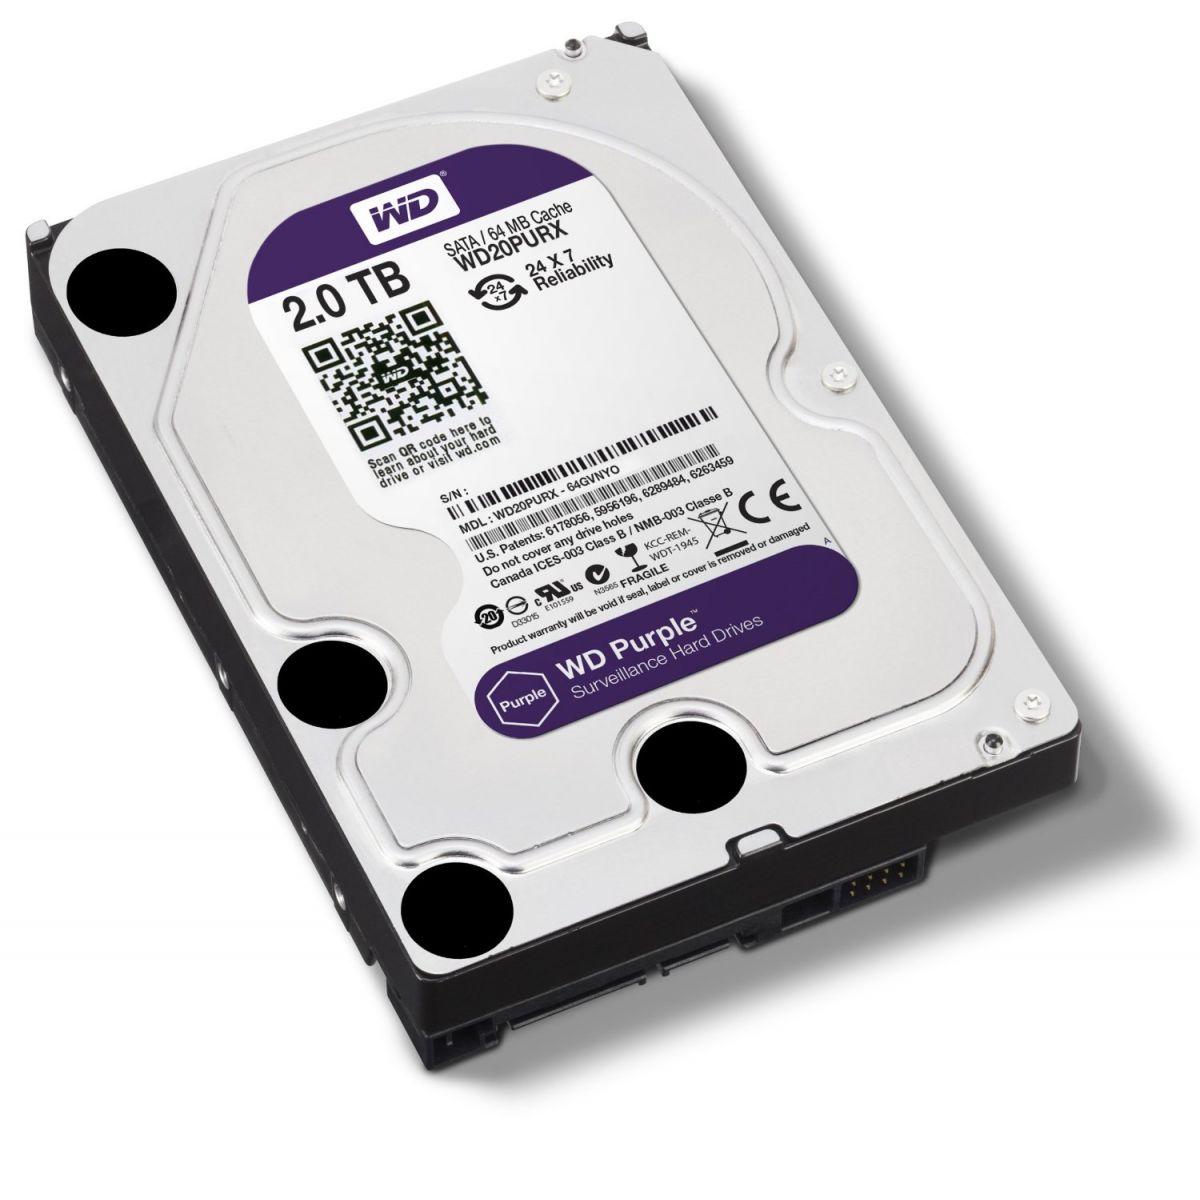 Hard Disk 2TB Sata III WD20PURX 64MB Cache Purple - Western Digital